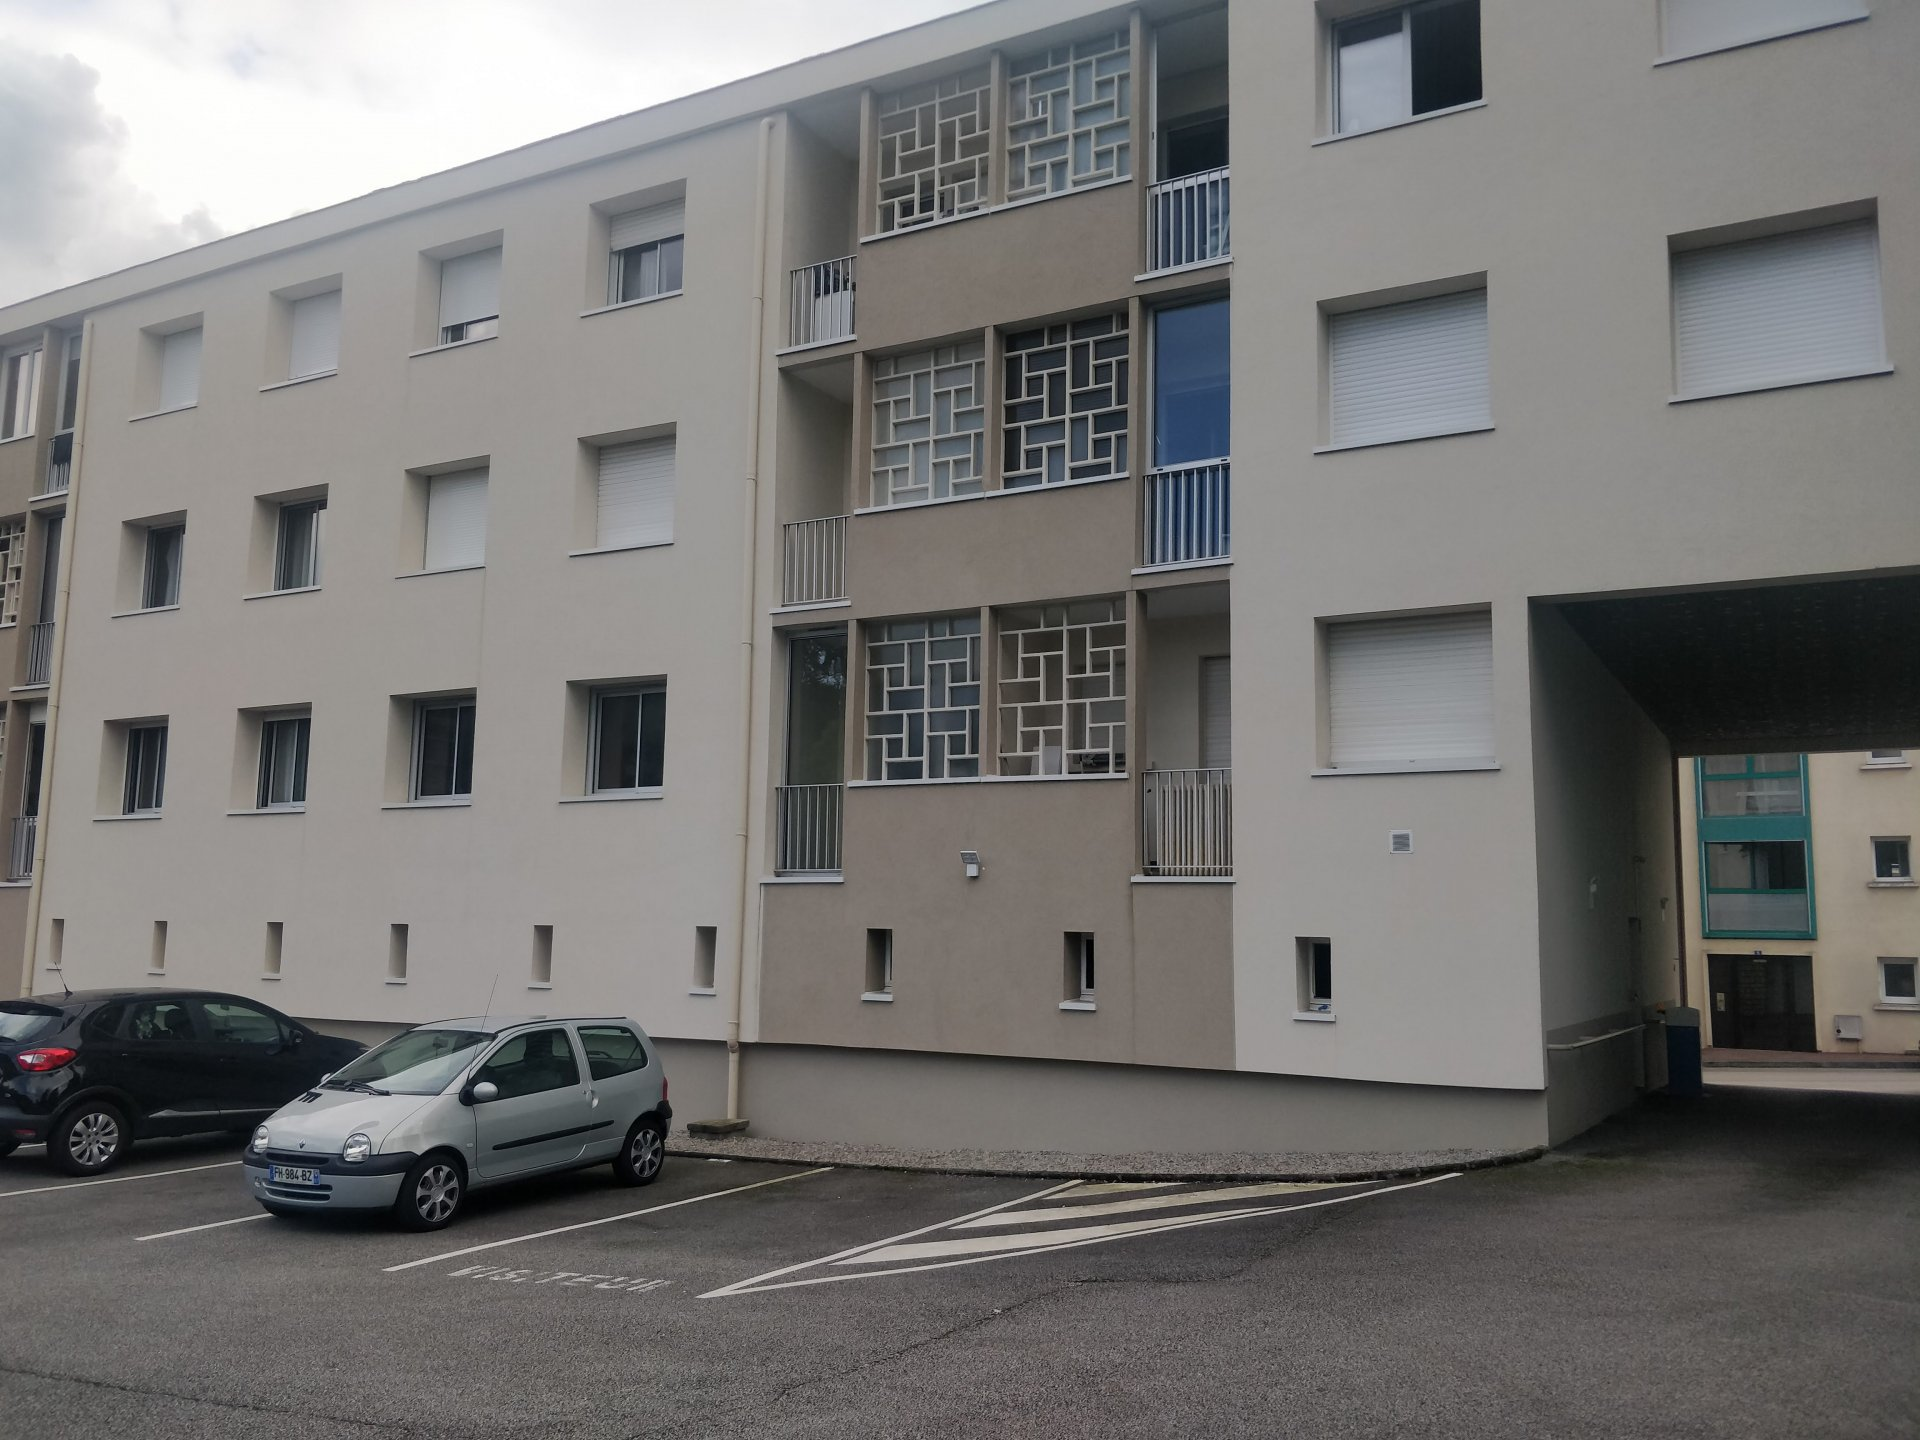 Joli appartement dans résidence av parking privé